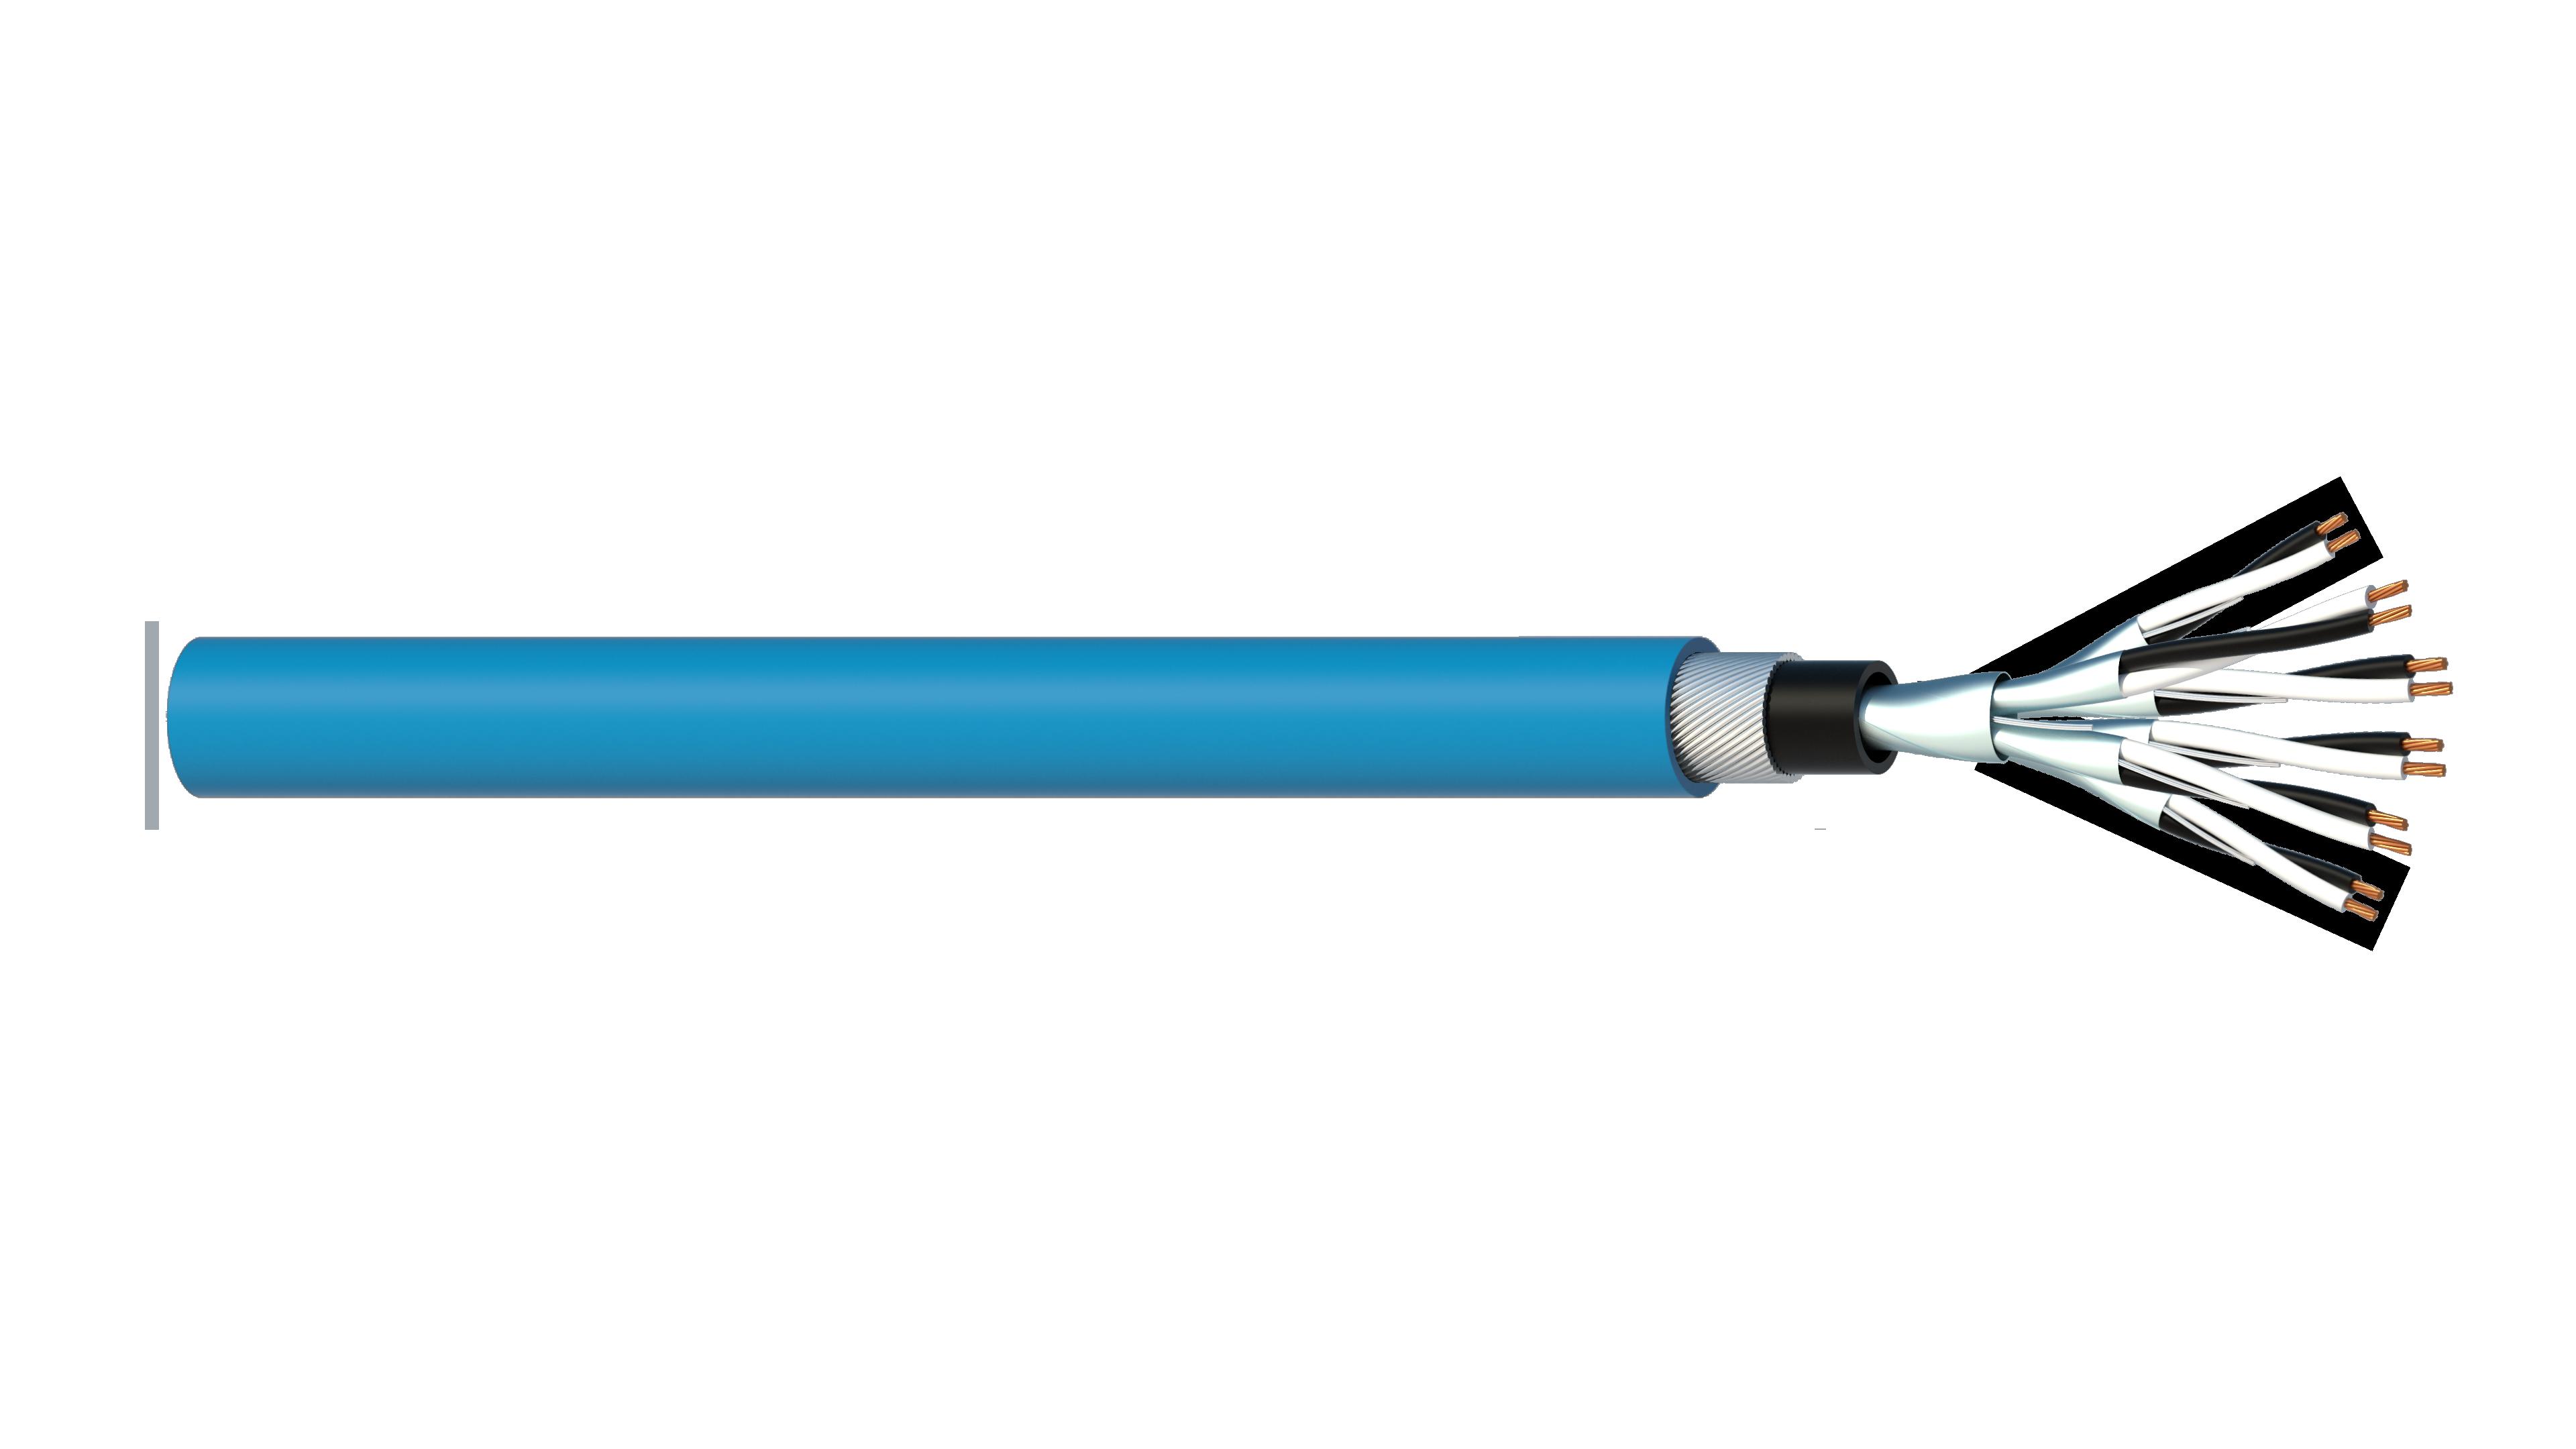 6 Pair 0.5mm2 Cu/PVC/ISOS/PVC/SWA/PVC Maser Instrumentation Cable - Blue Sheath